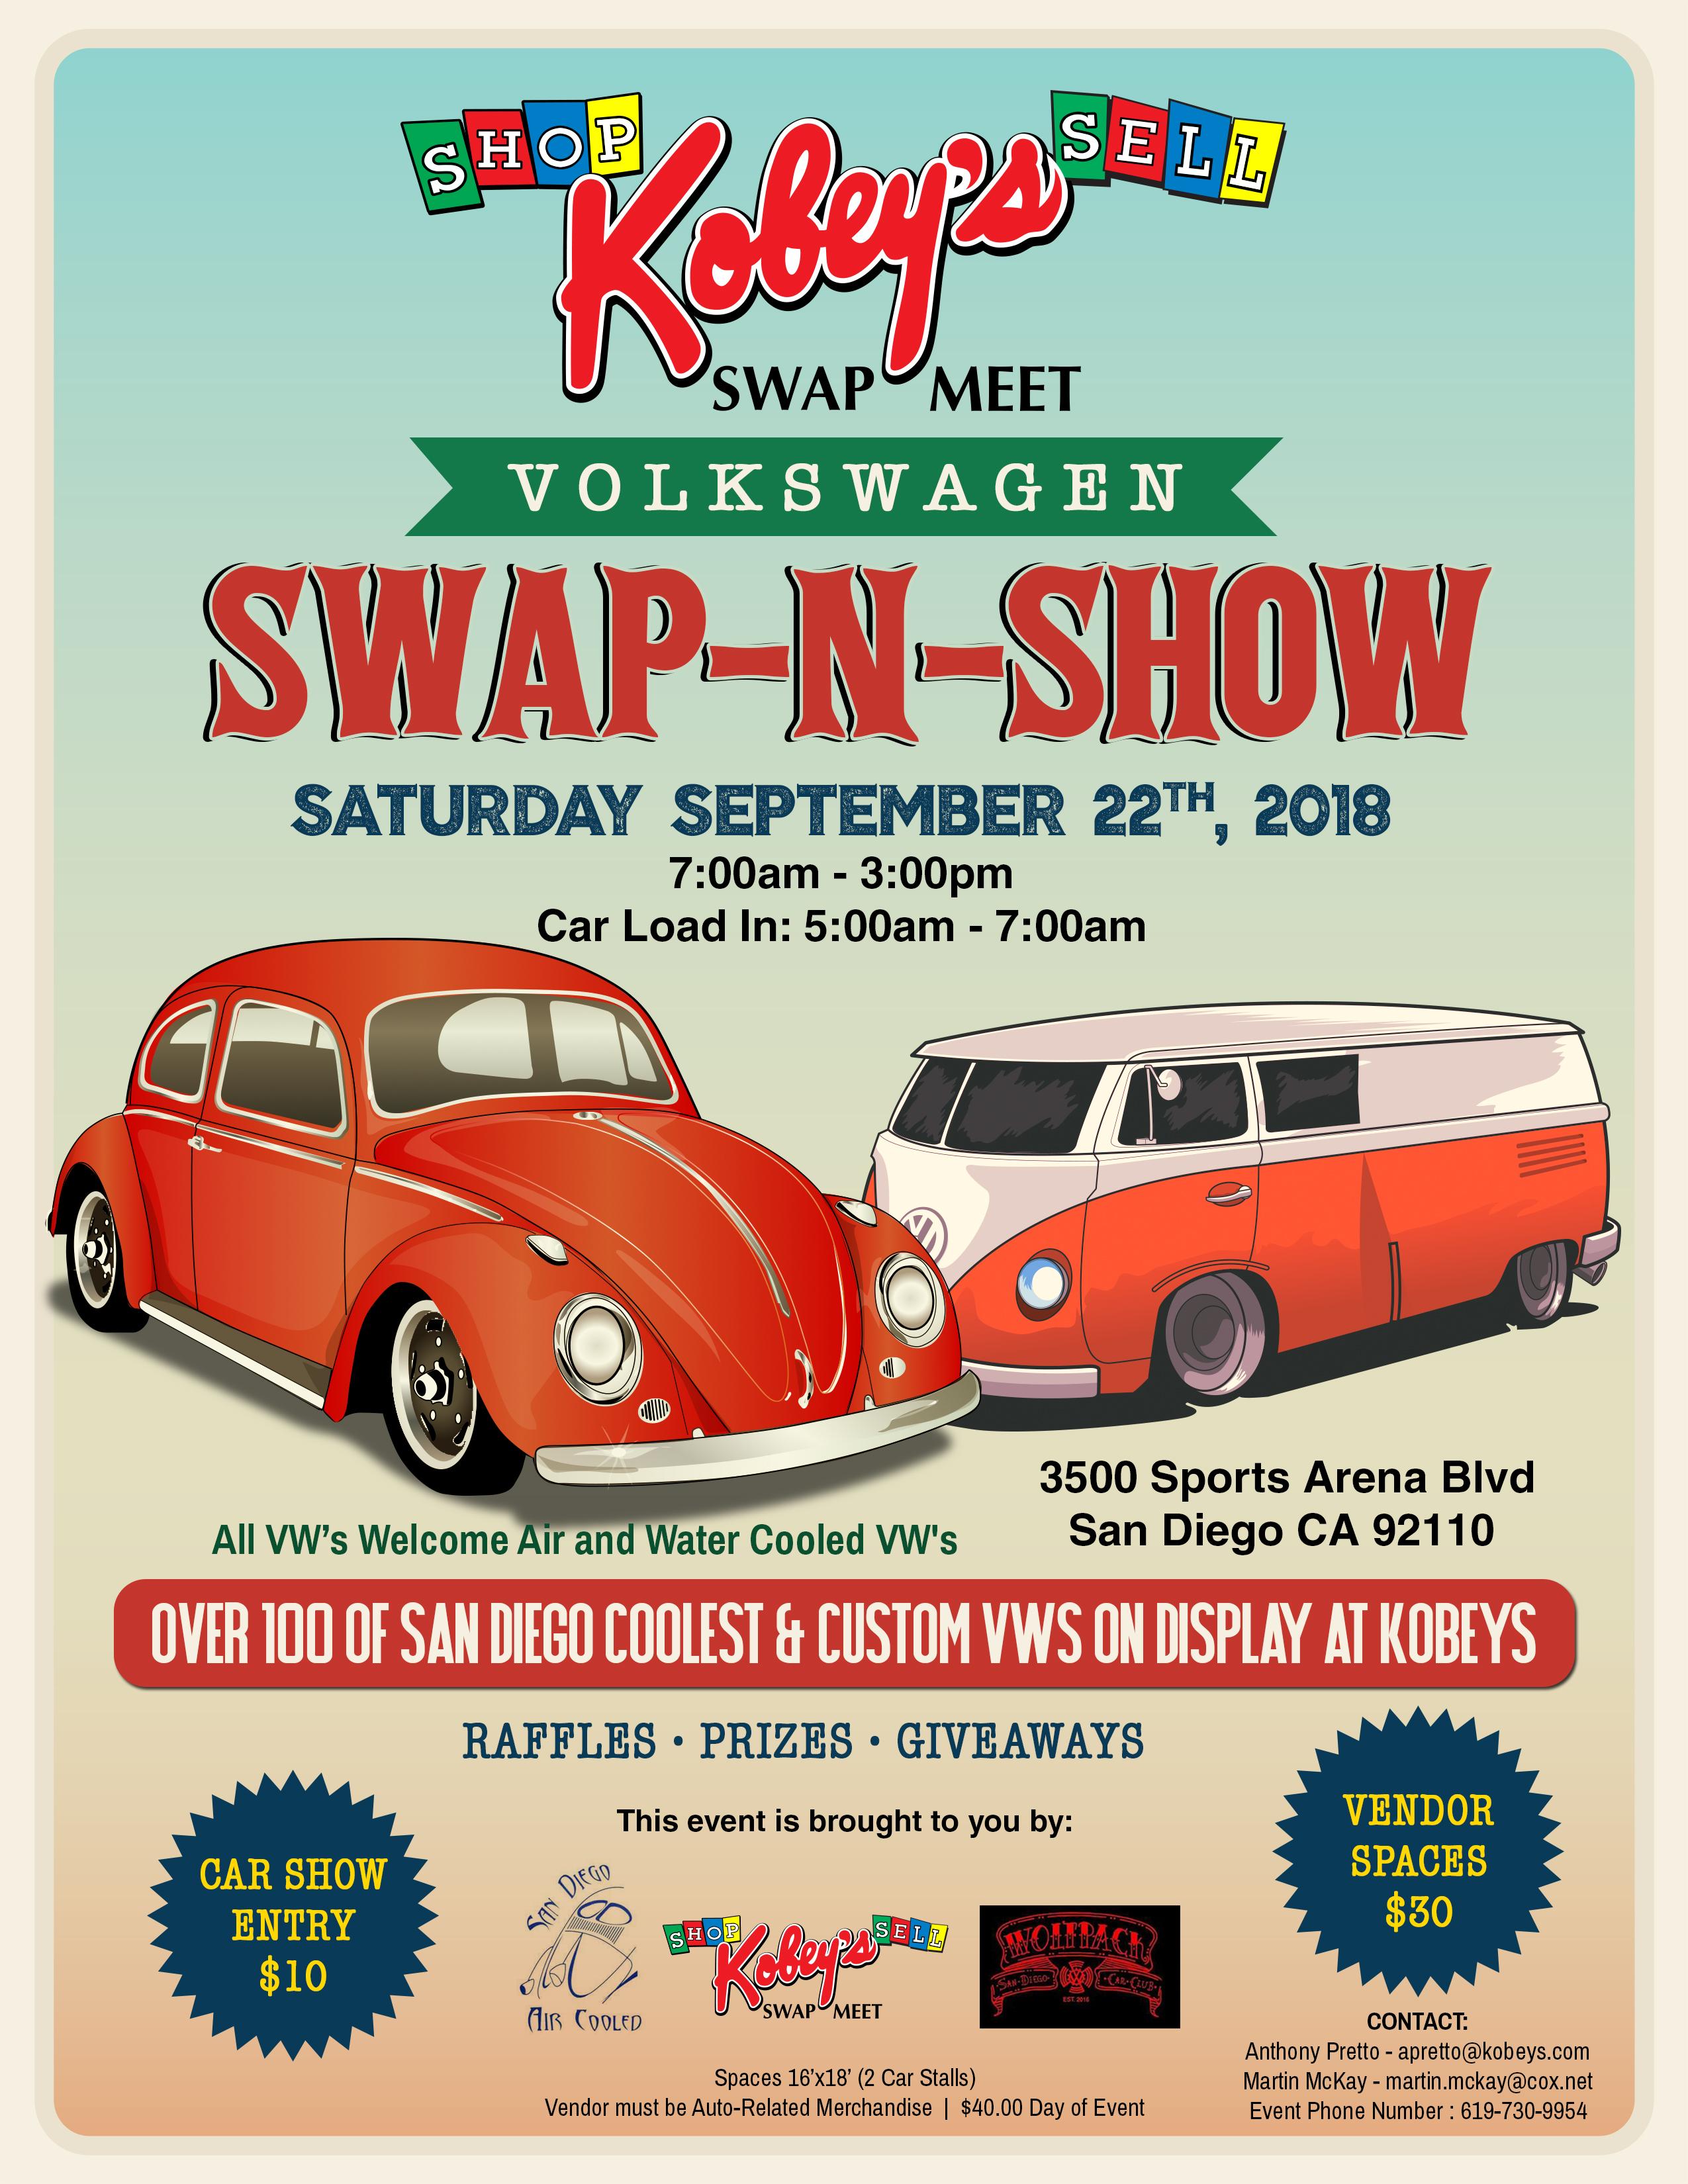 San Diego Events For September San Diego Reader - San diego classic car show 2018